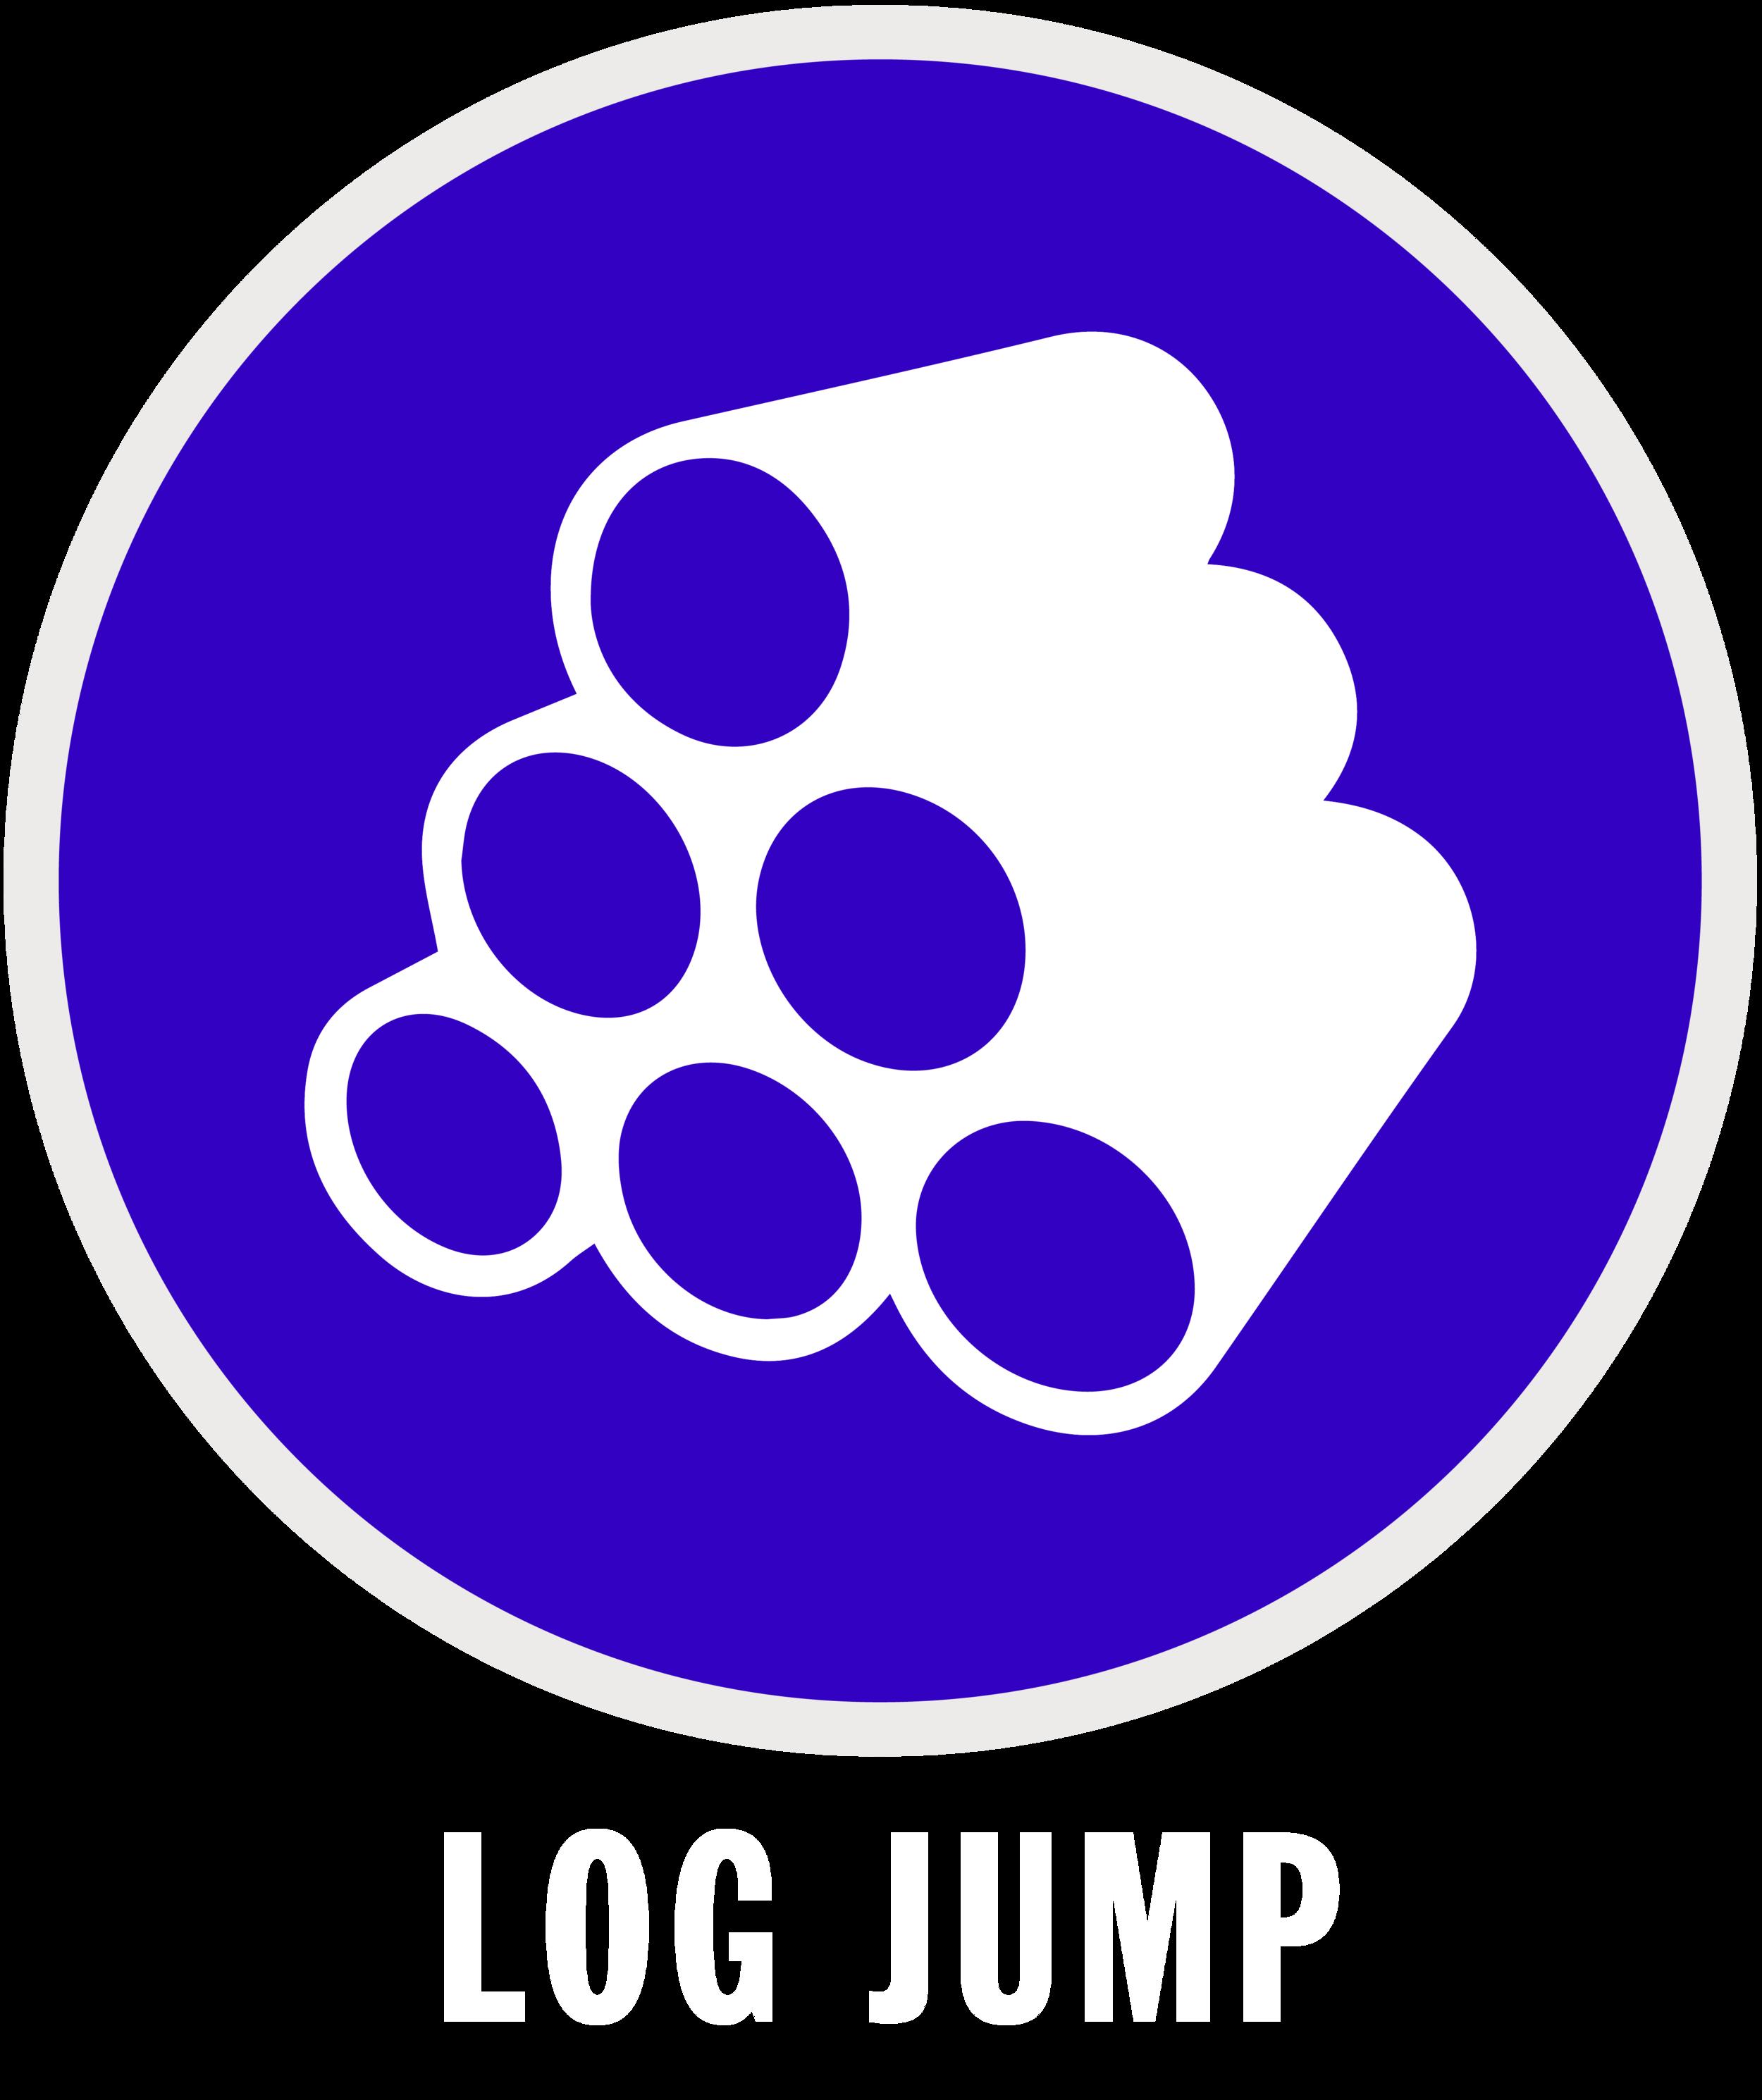 log_jump.png